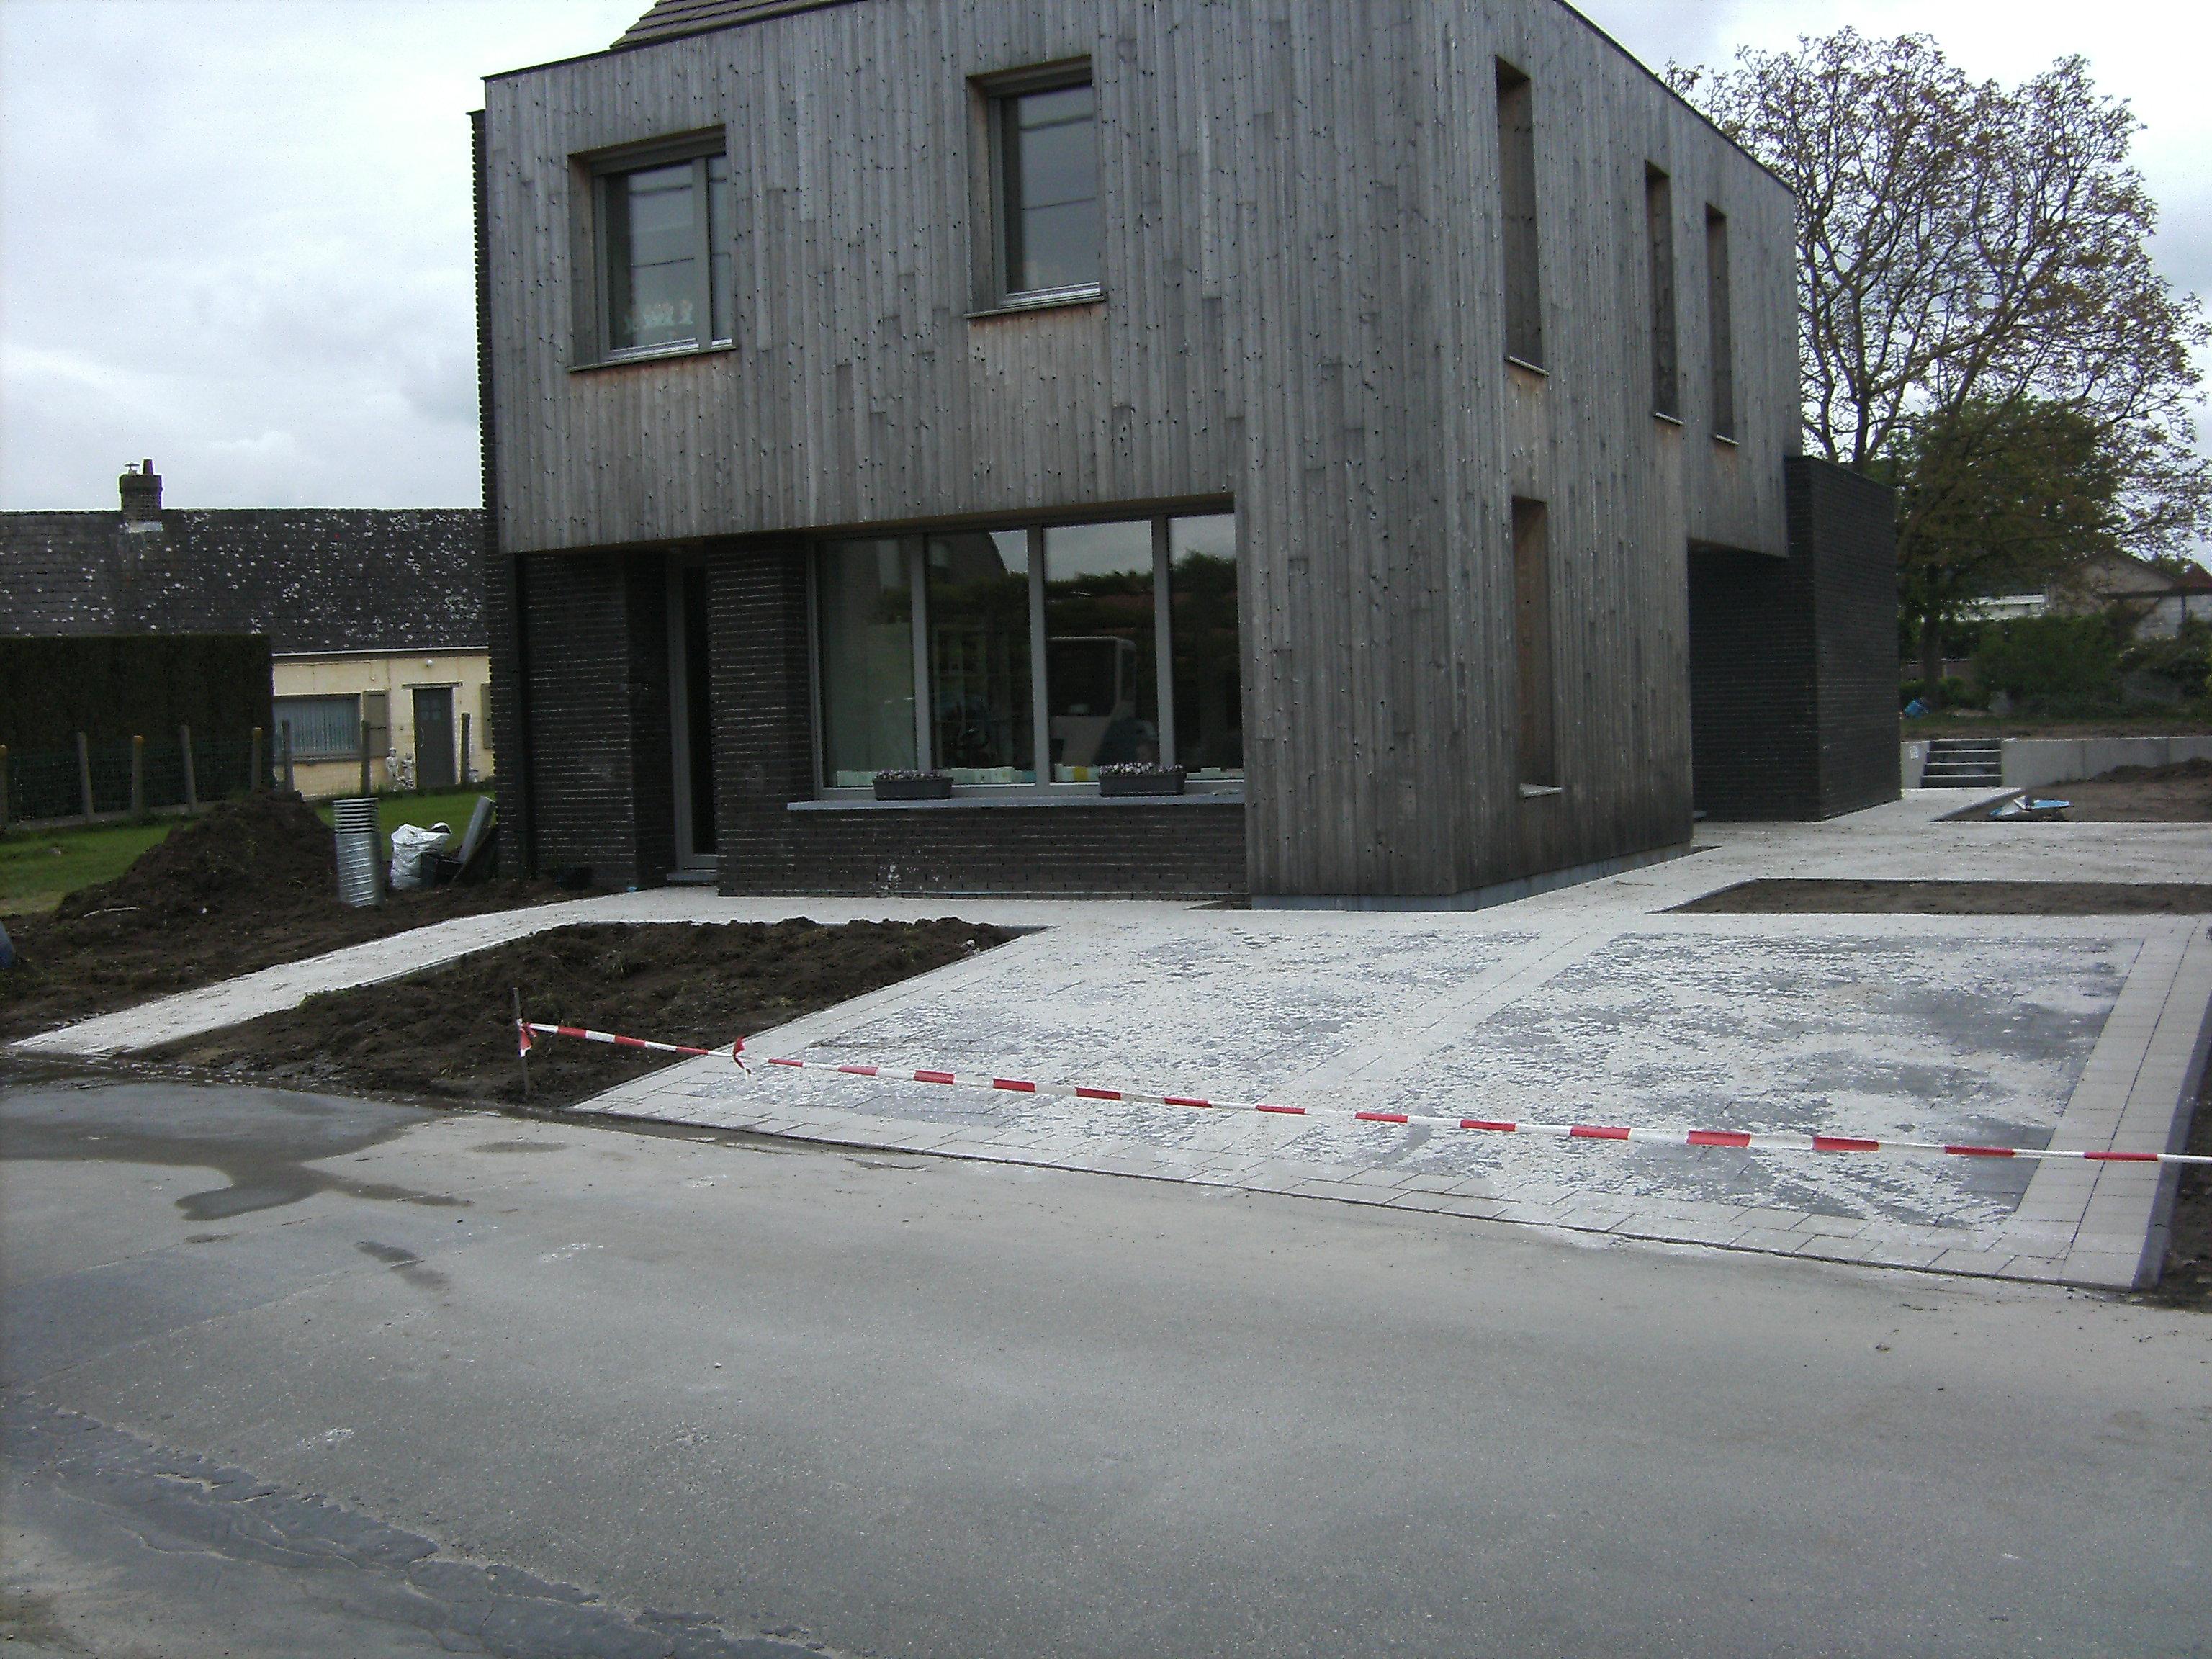 betonklinkers wit-antraciet bezand